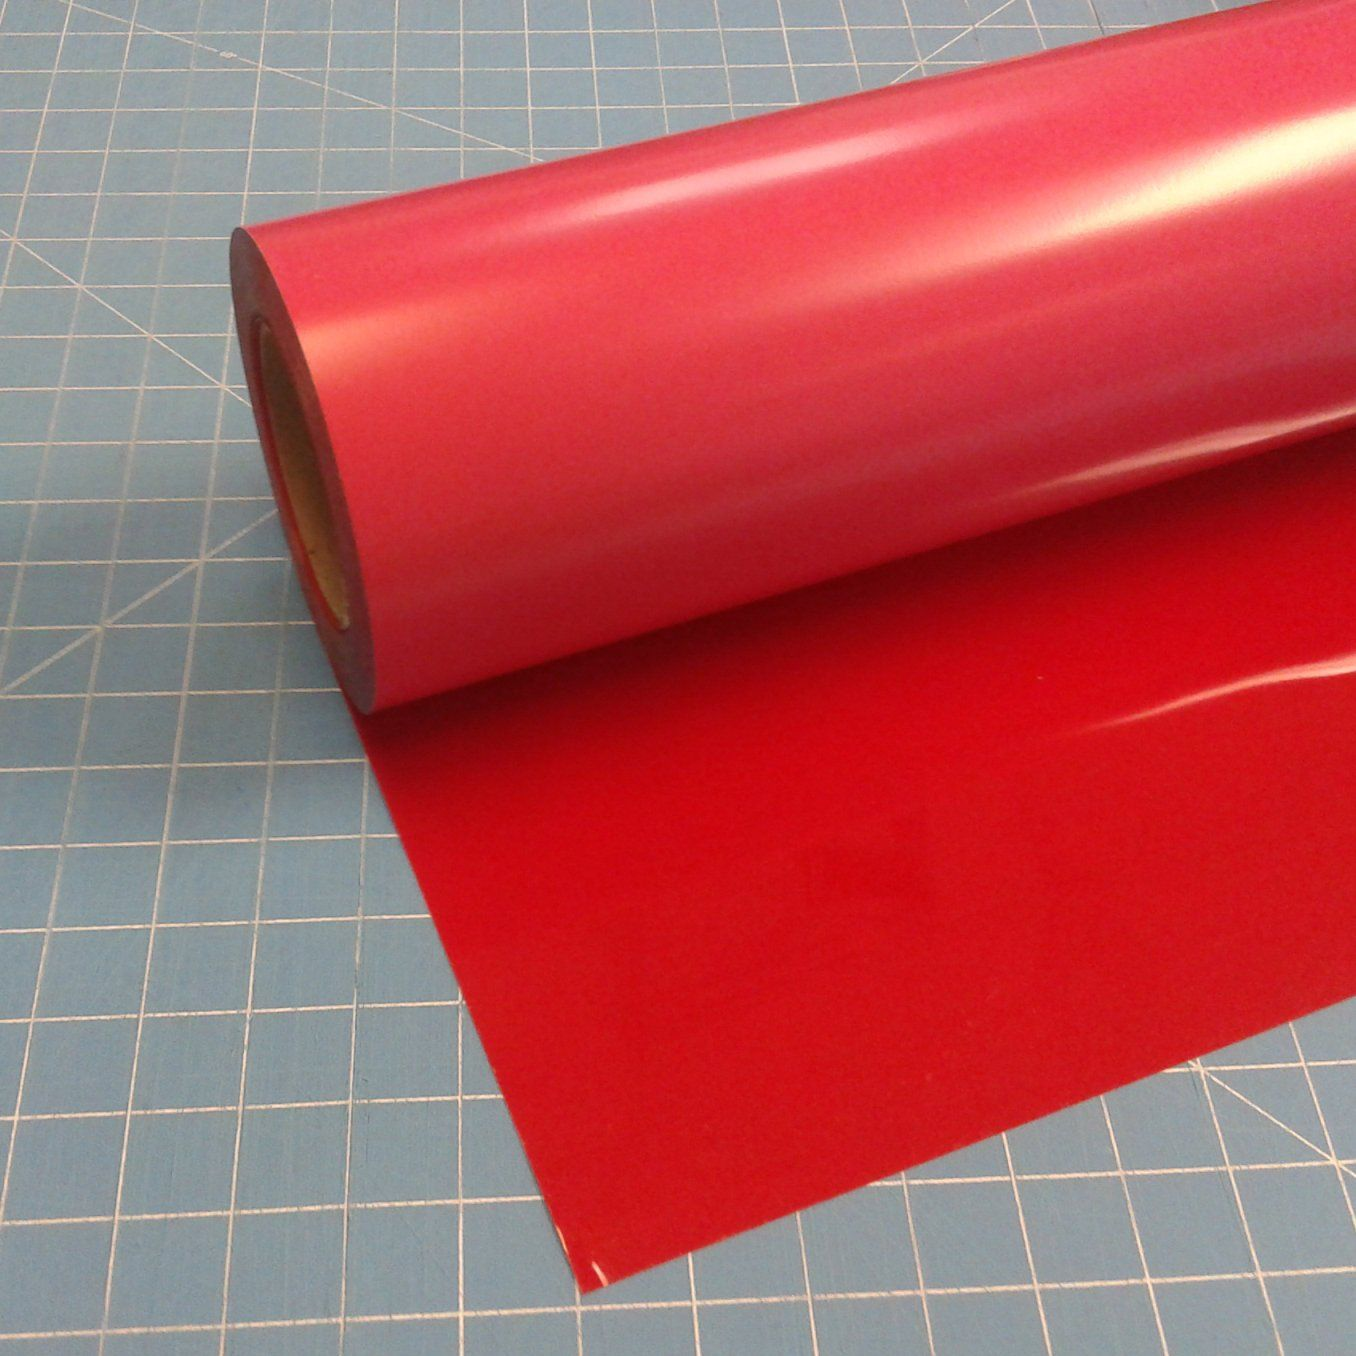 Siser Easyweed Stretch Black 15 x 20 Iron on Heat Transfer Vinyl Roll Coaches World